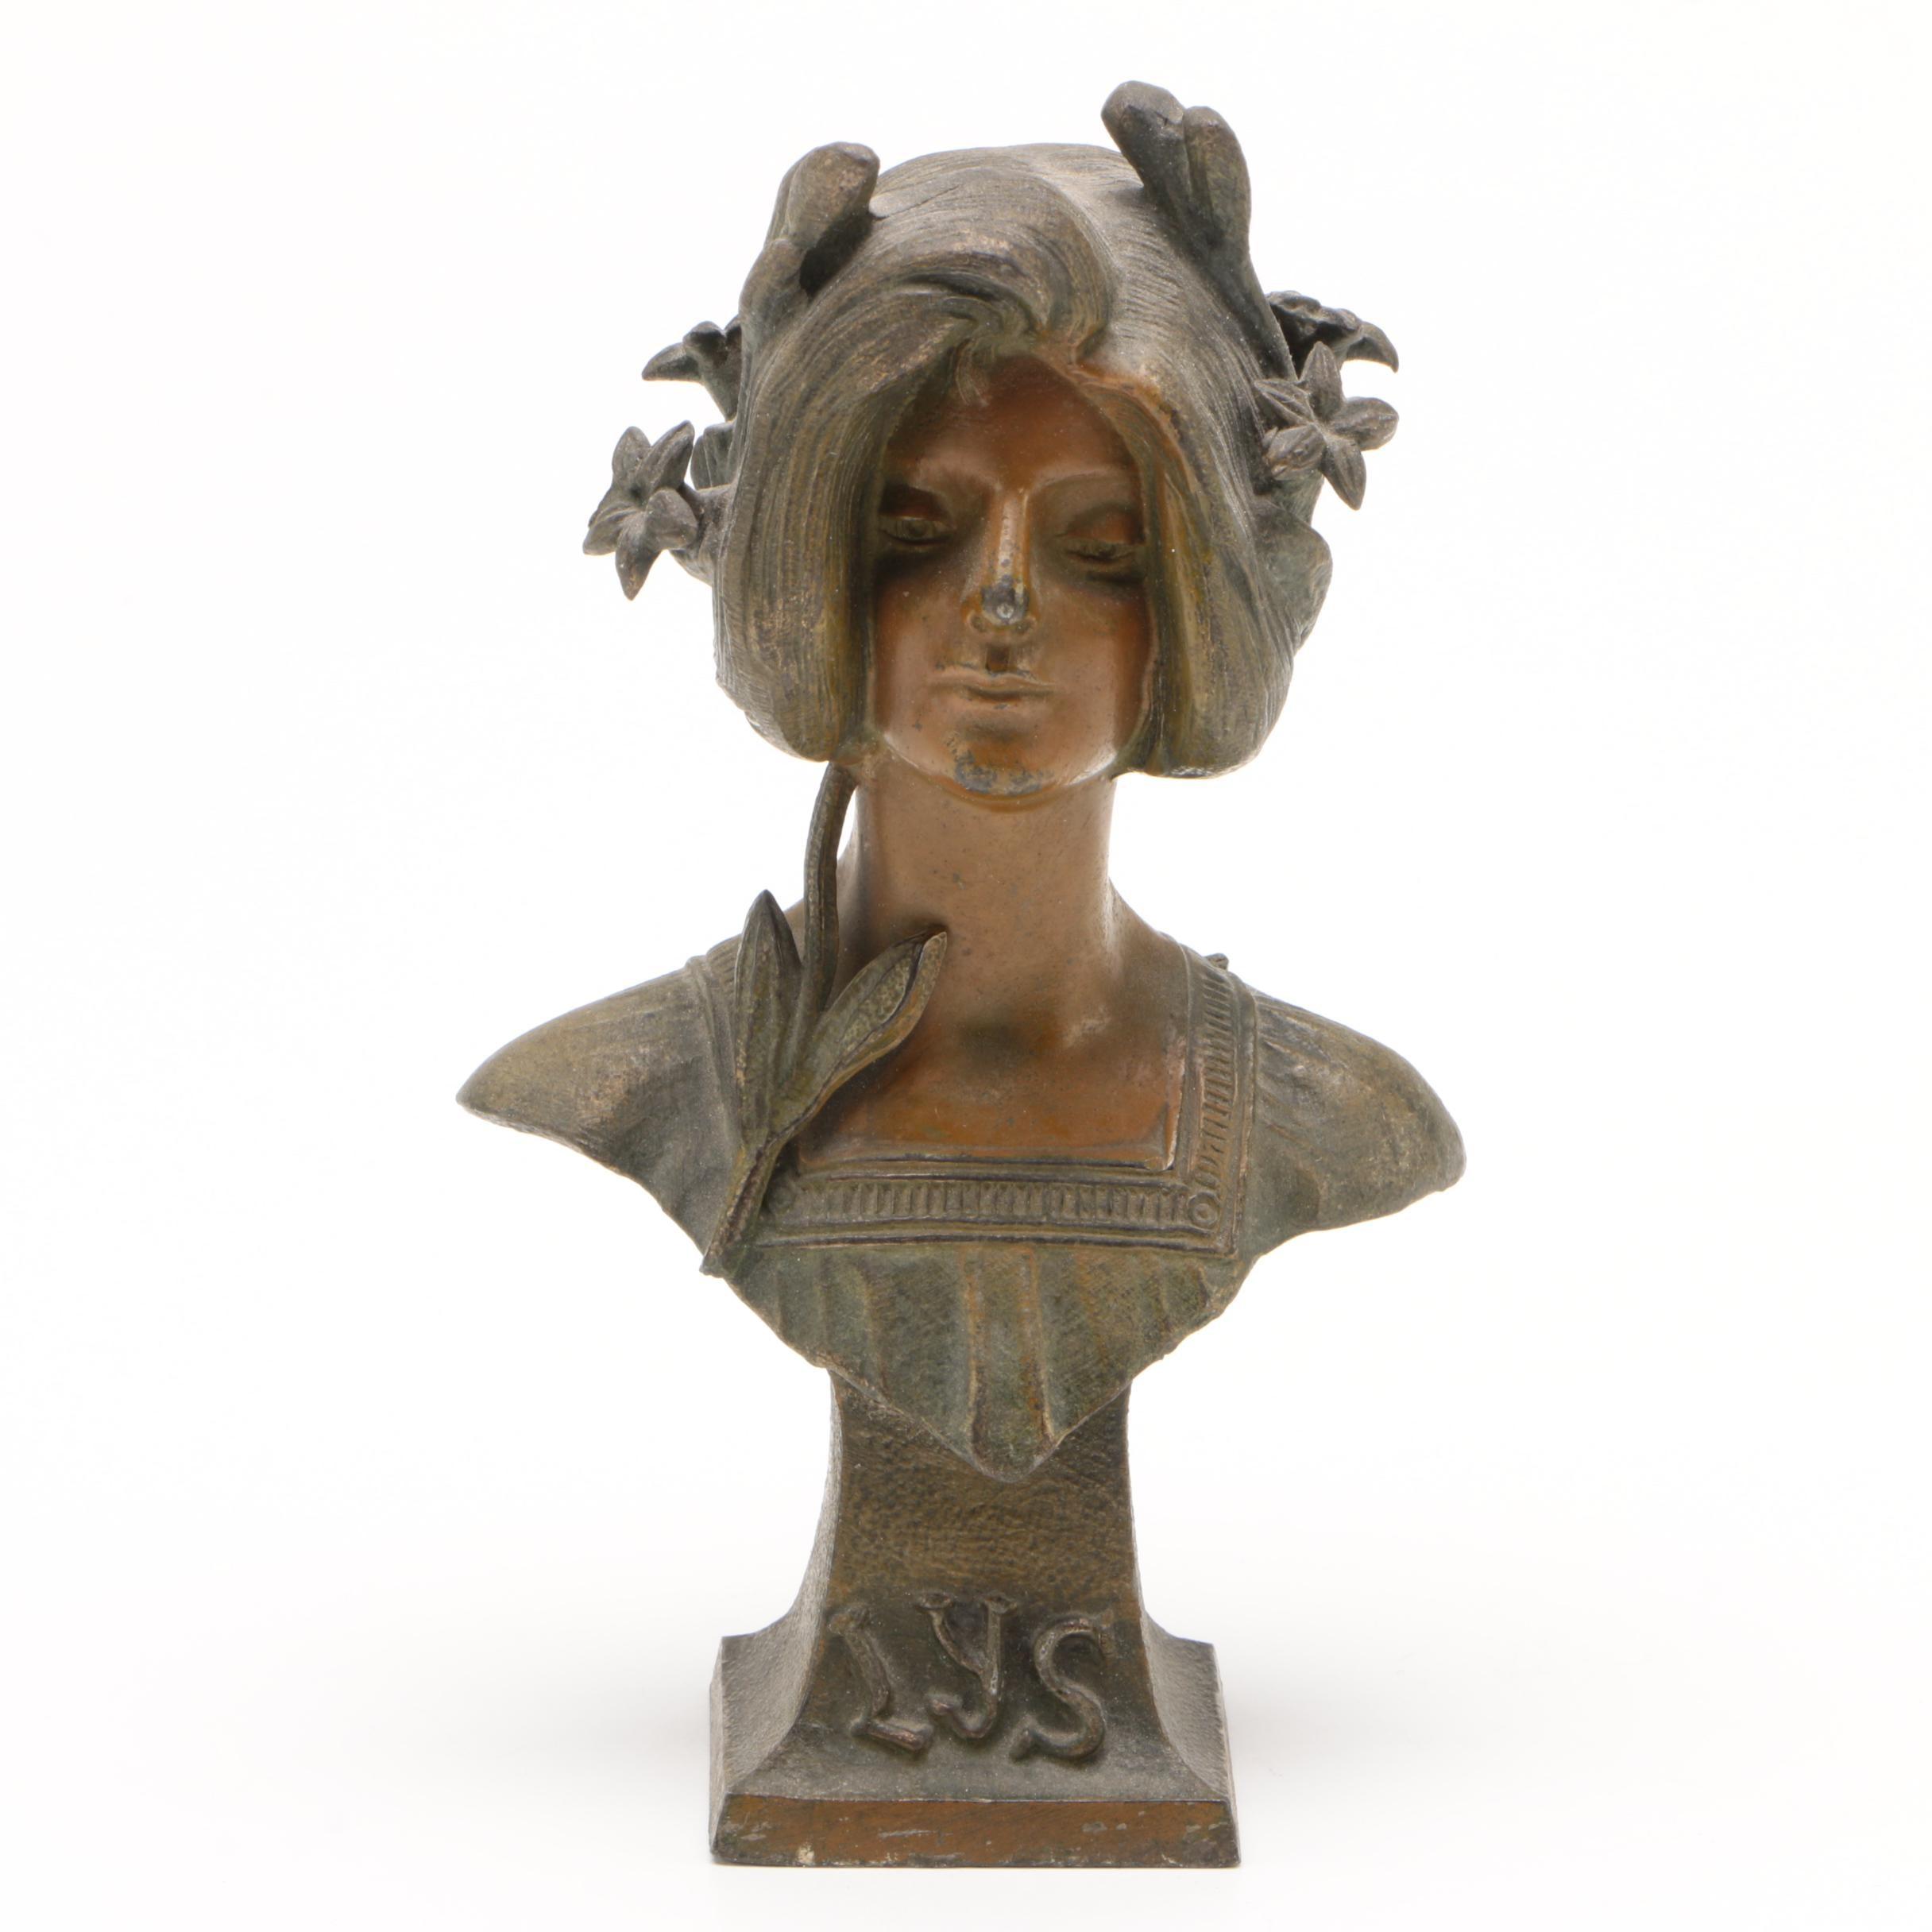 Art Nouveau Style Cast Metal Bust, Early 20th Century